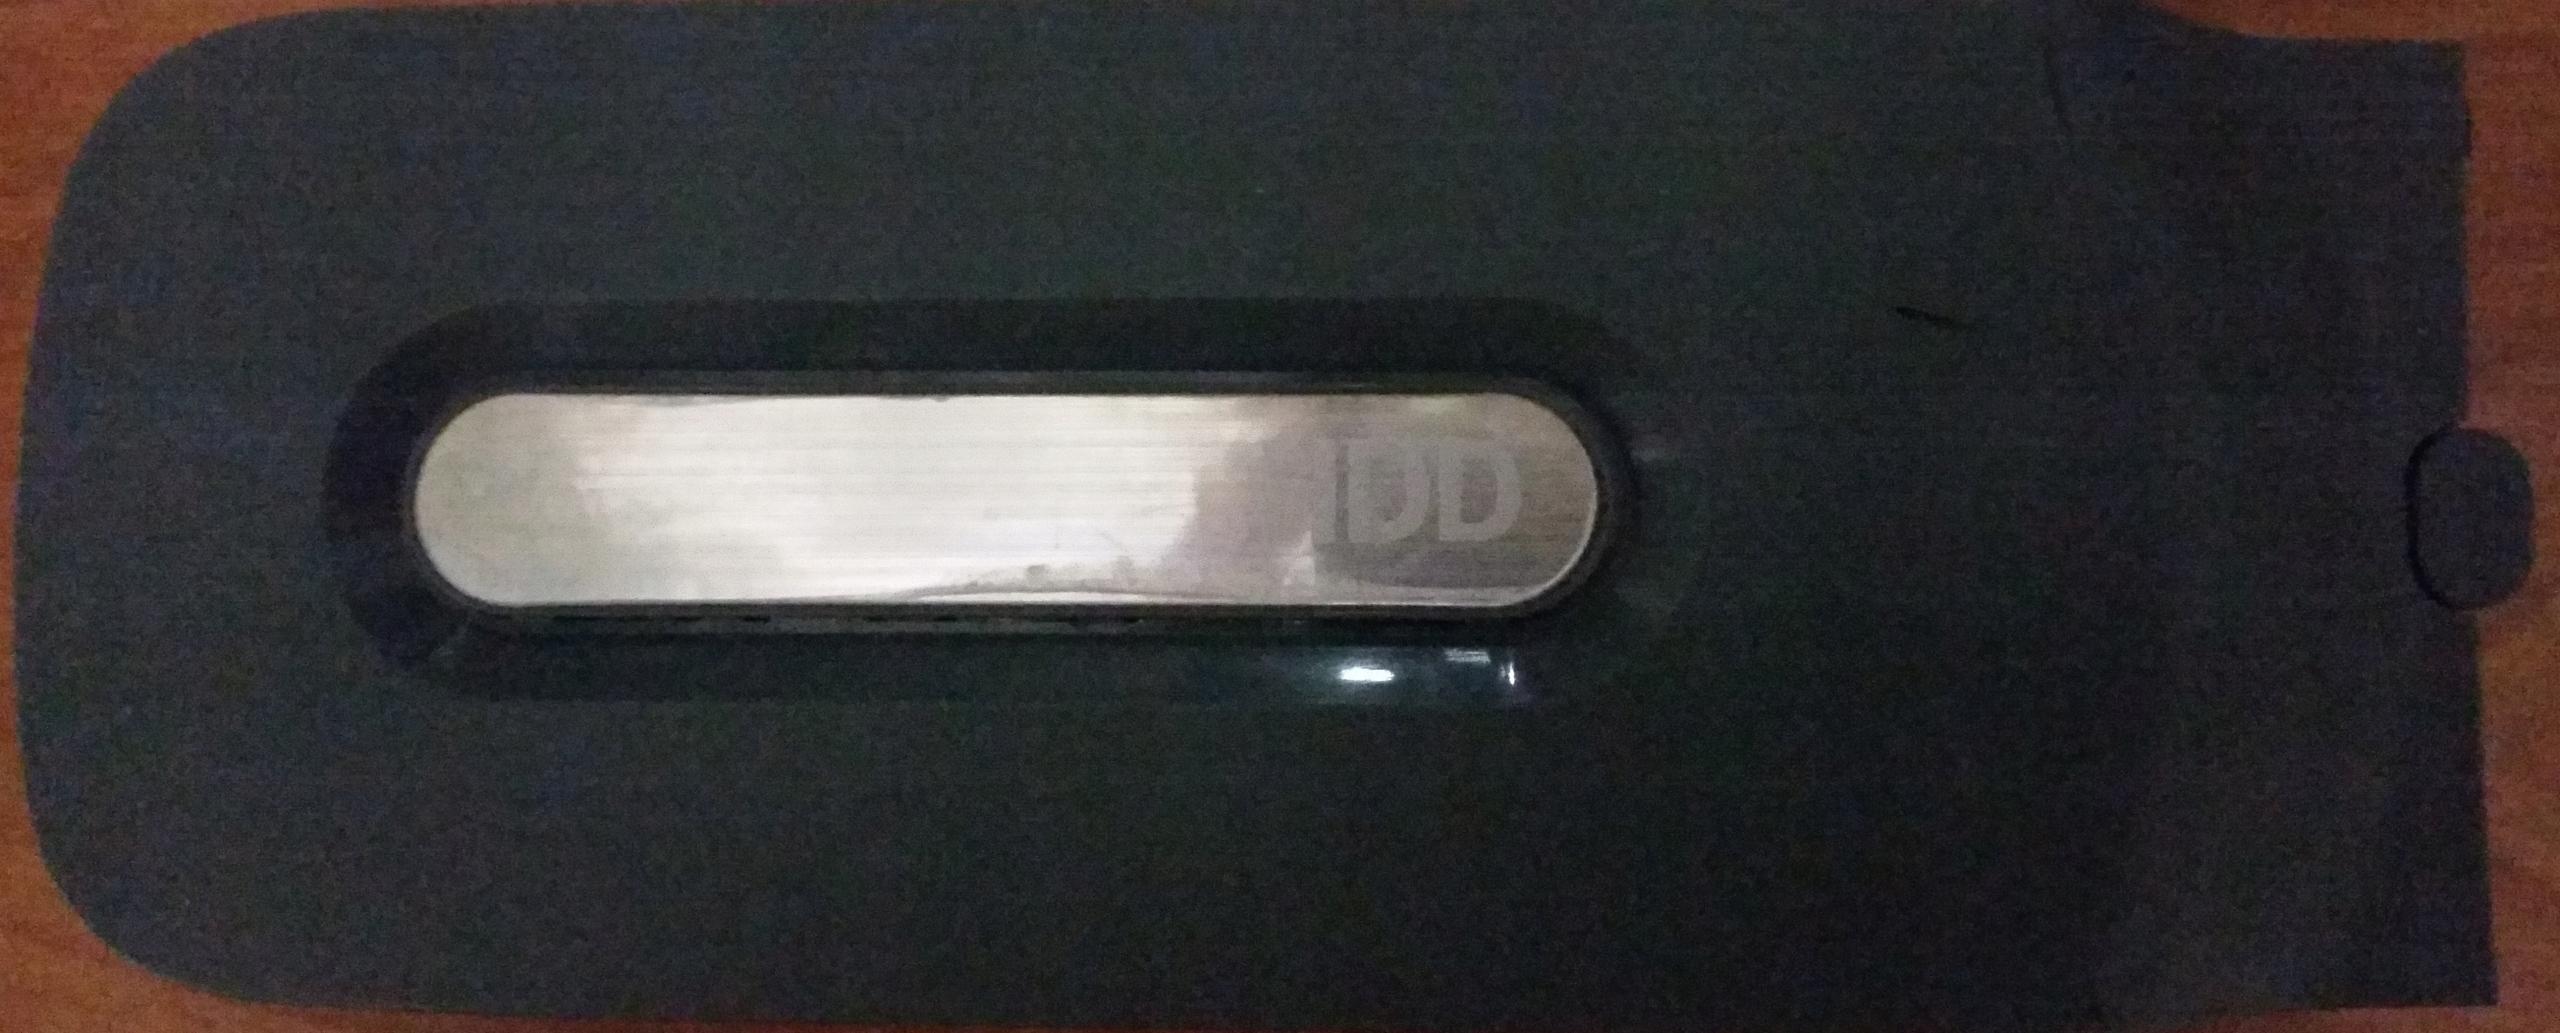 ORYGINALNY DYSK HDD 250 GB MICROSOFT XBOX 360